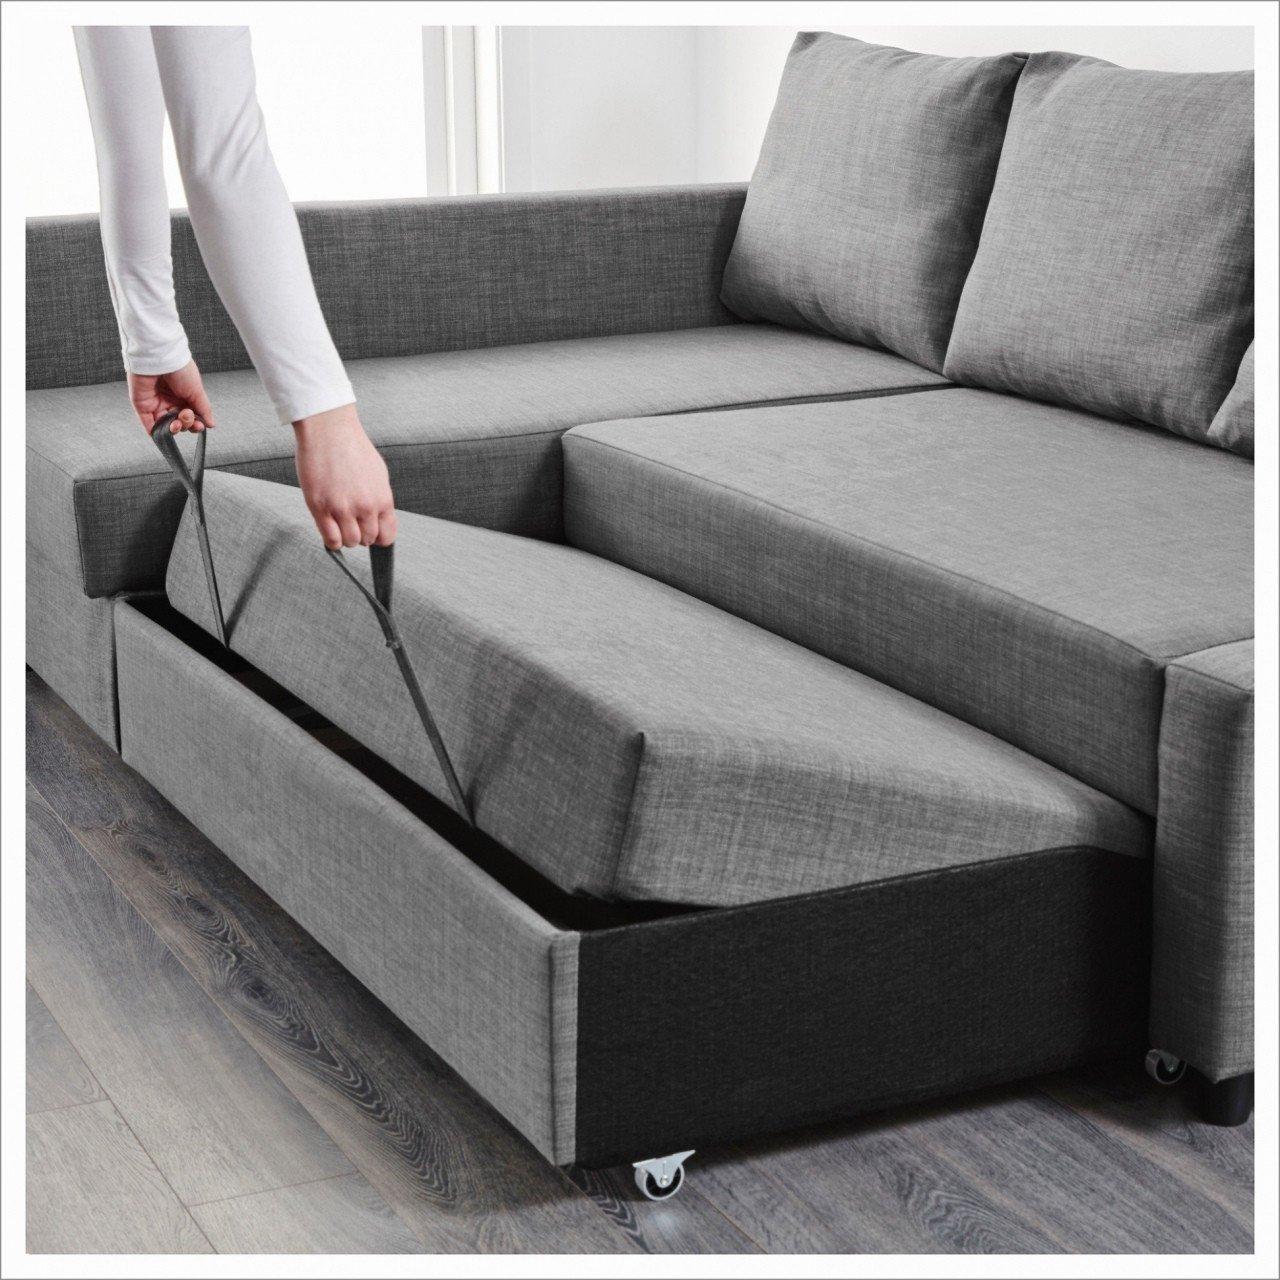 Bedroom Set for Boy Elegant Lazy Boy sofa Bed — Procura Home Blog